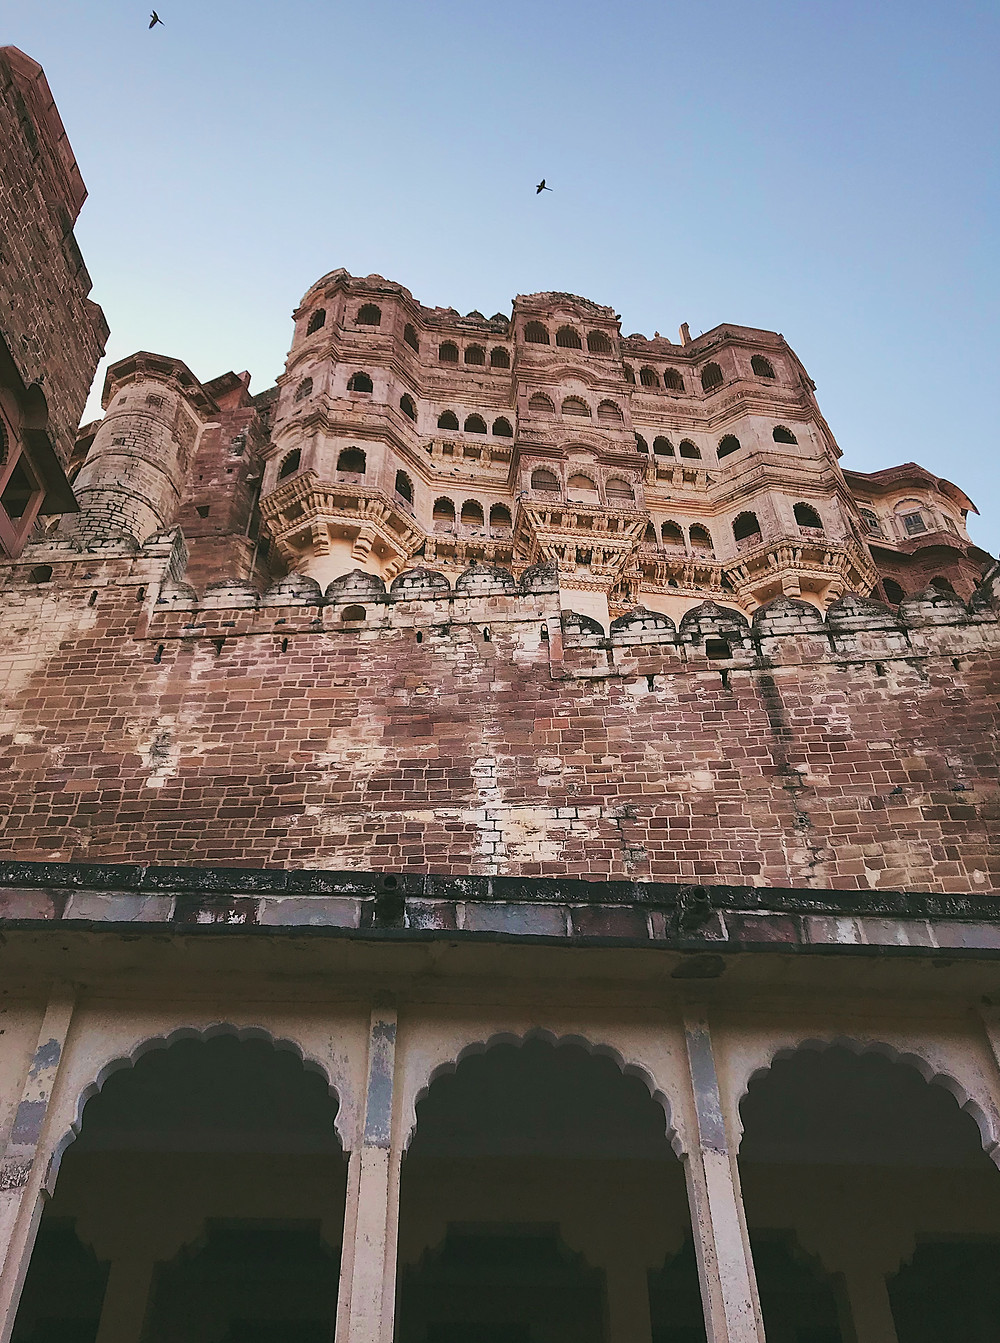 Mehrangarh Fort, an impressive fort in Jodhpur, Rajasthan, India